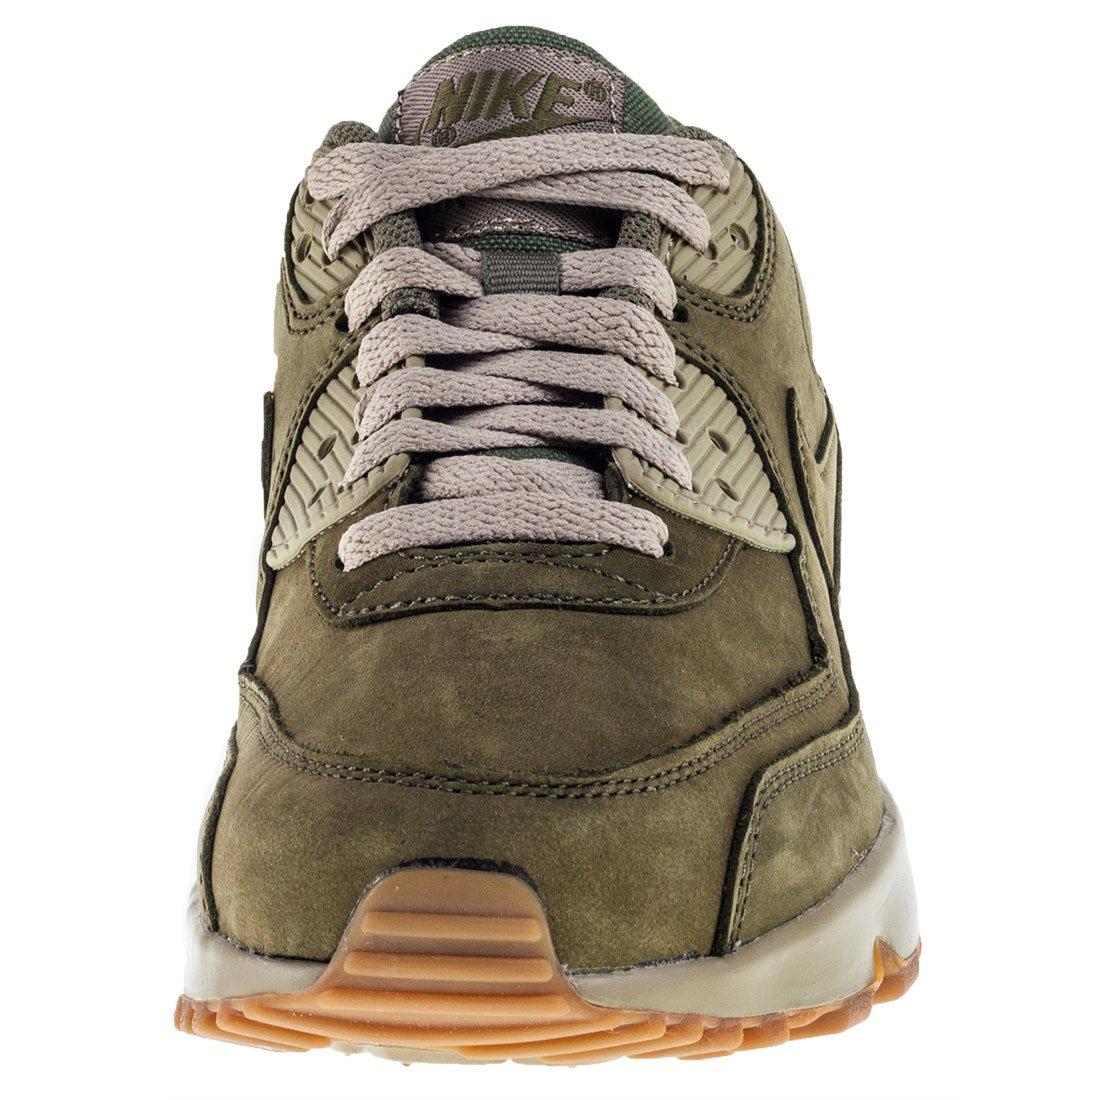 outlet store e93bc d2210 Amazon.com   Nike Air Max 90 Winter Premium (Kids)   Shoes